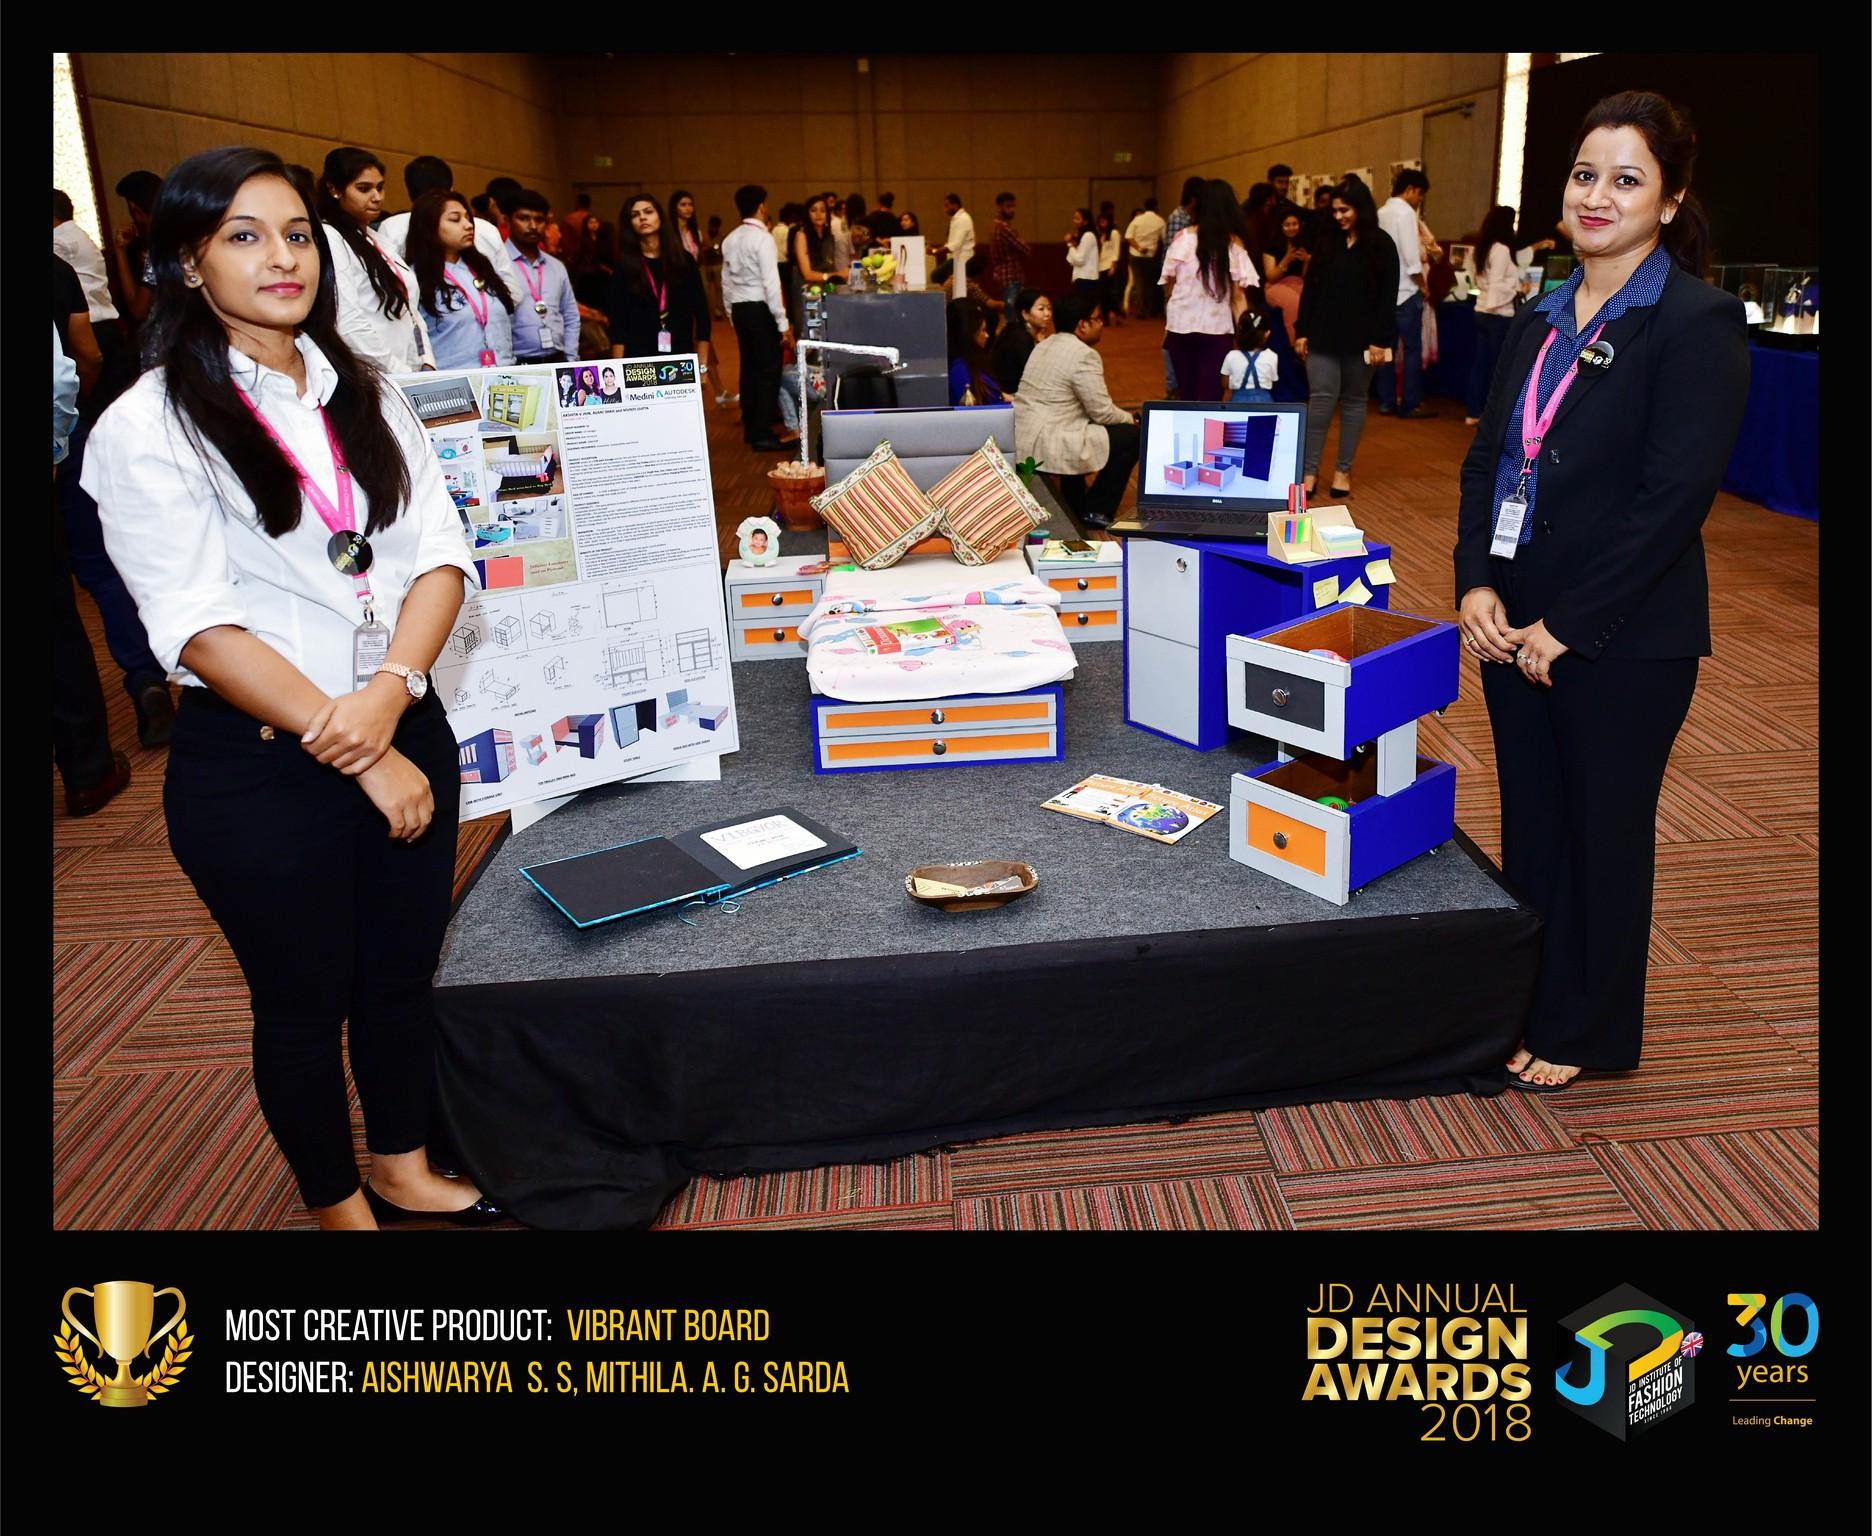 Vibrant board – Change – JD Annual Design Awards 2018 | Designer: Aishwarya.s.s, Mithila.A.G.Sarda | Photography : Jerin Nath (@jerin_nath) vibrant board - vibrant board - Vibrant board – Change – JD Annual Design Awards 2018